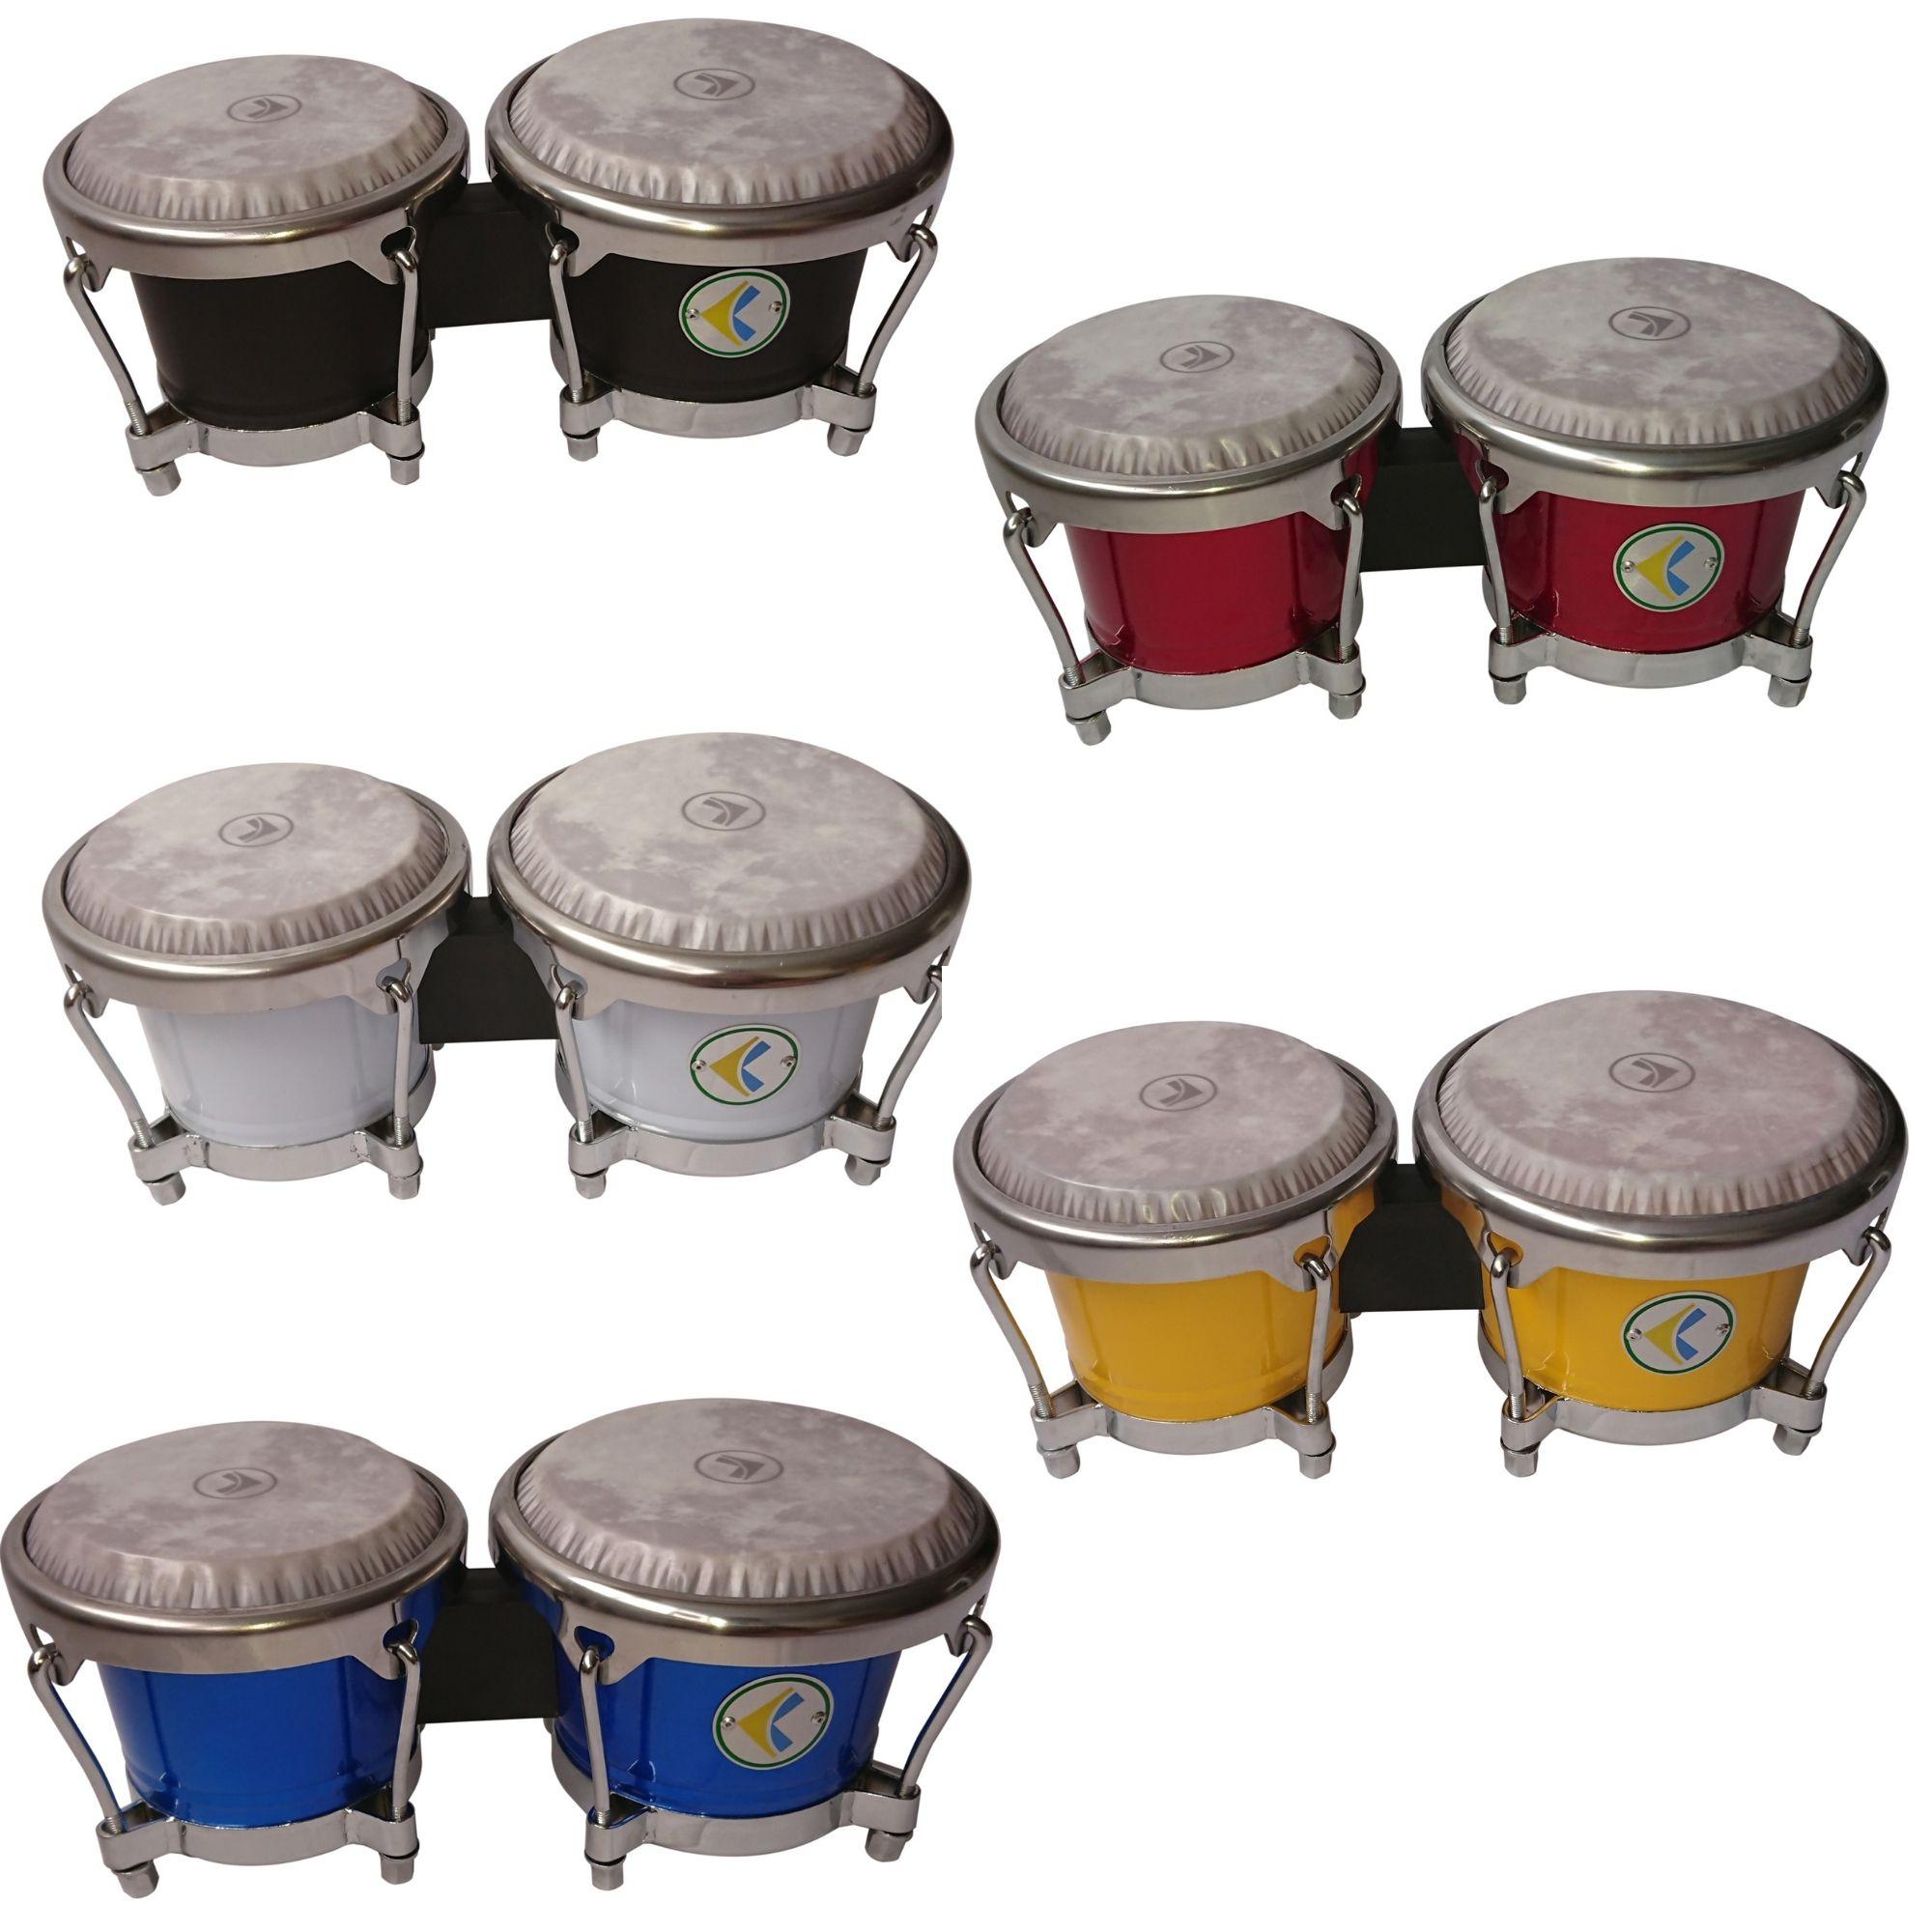 Bongô metal LUEN. 06 e 07 Polegadas série Colorsteel, pele fiber control - varias cores.